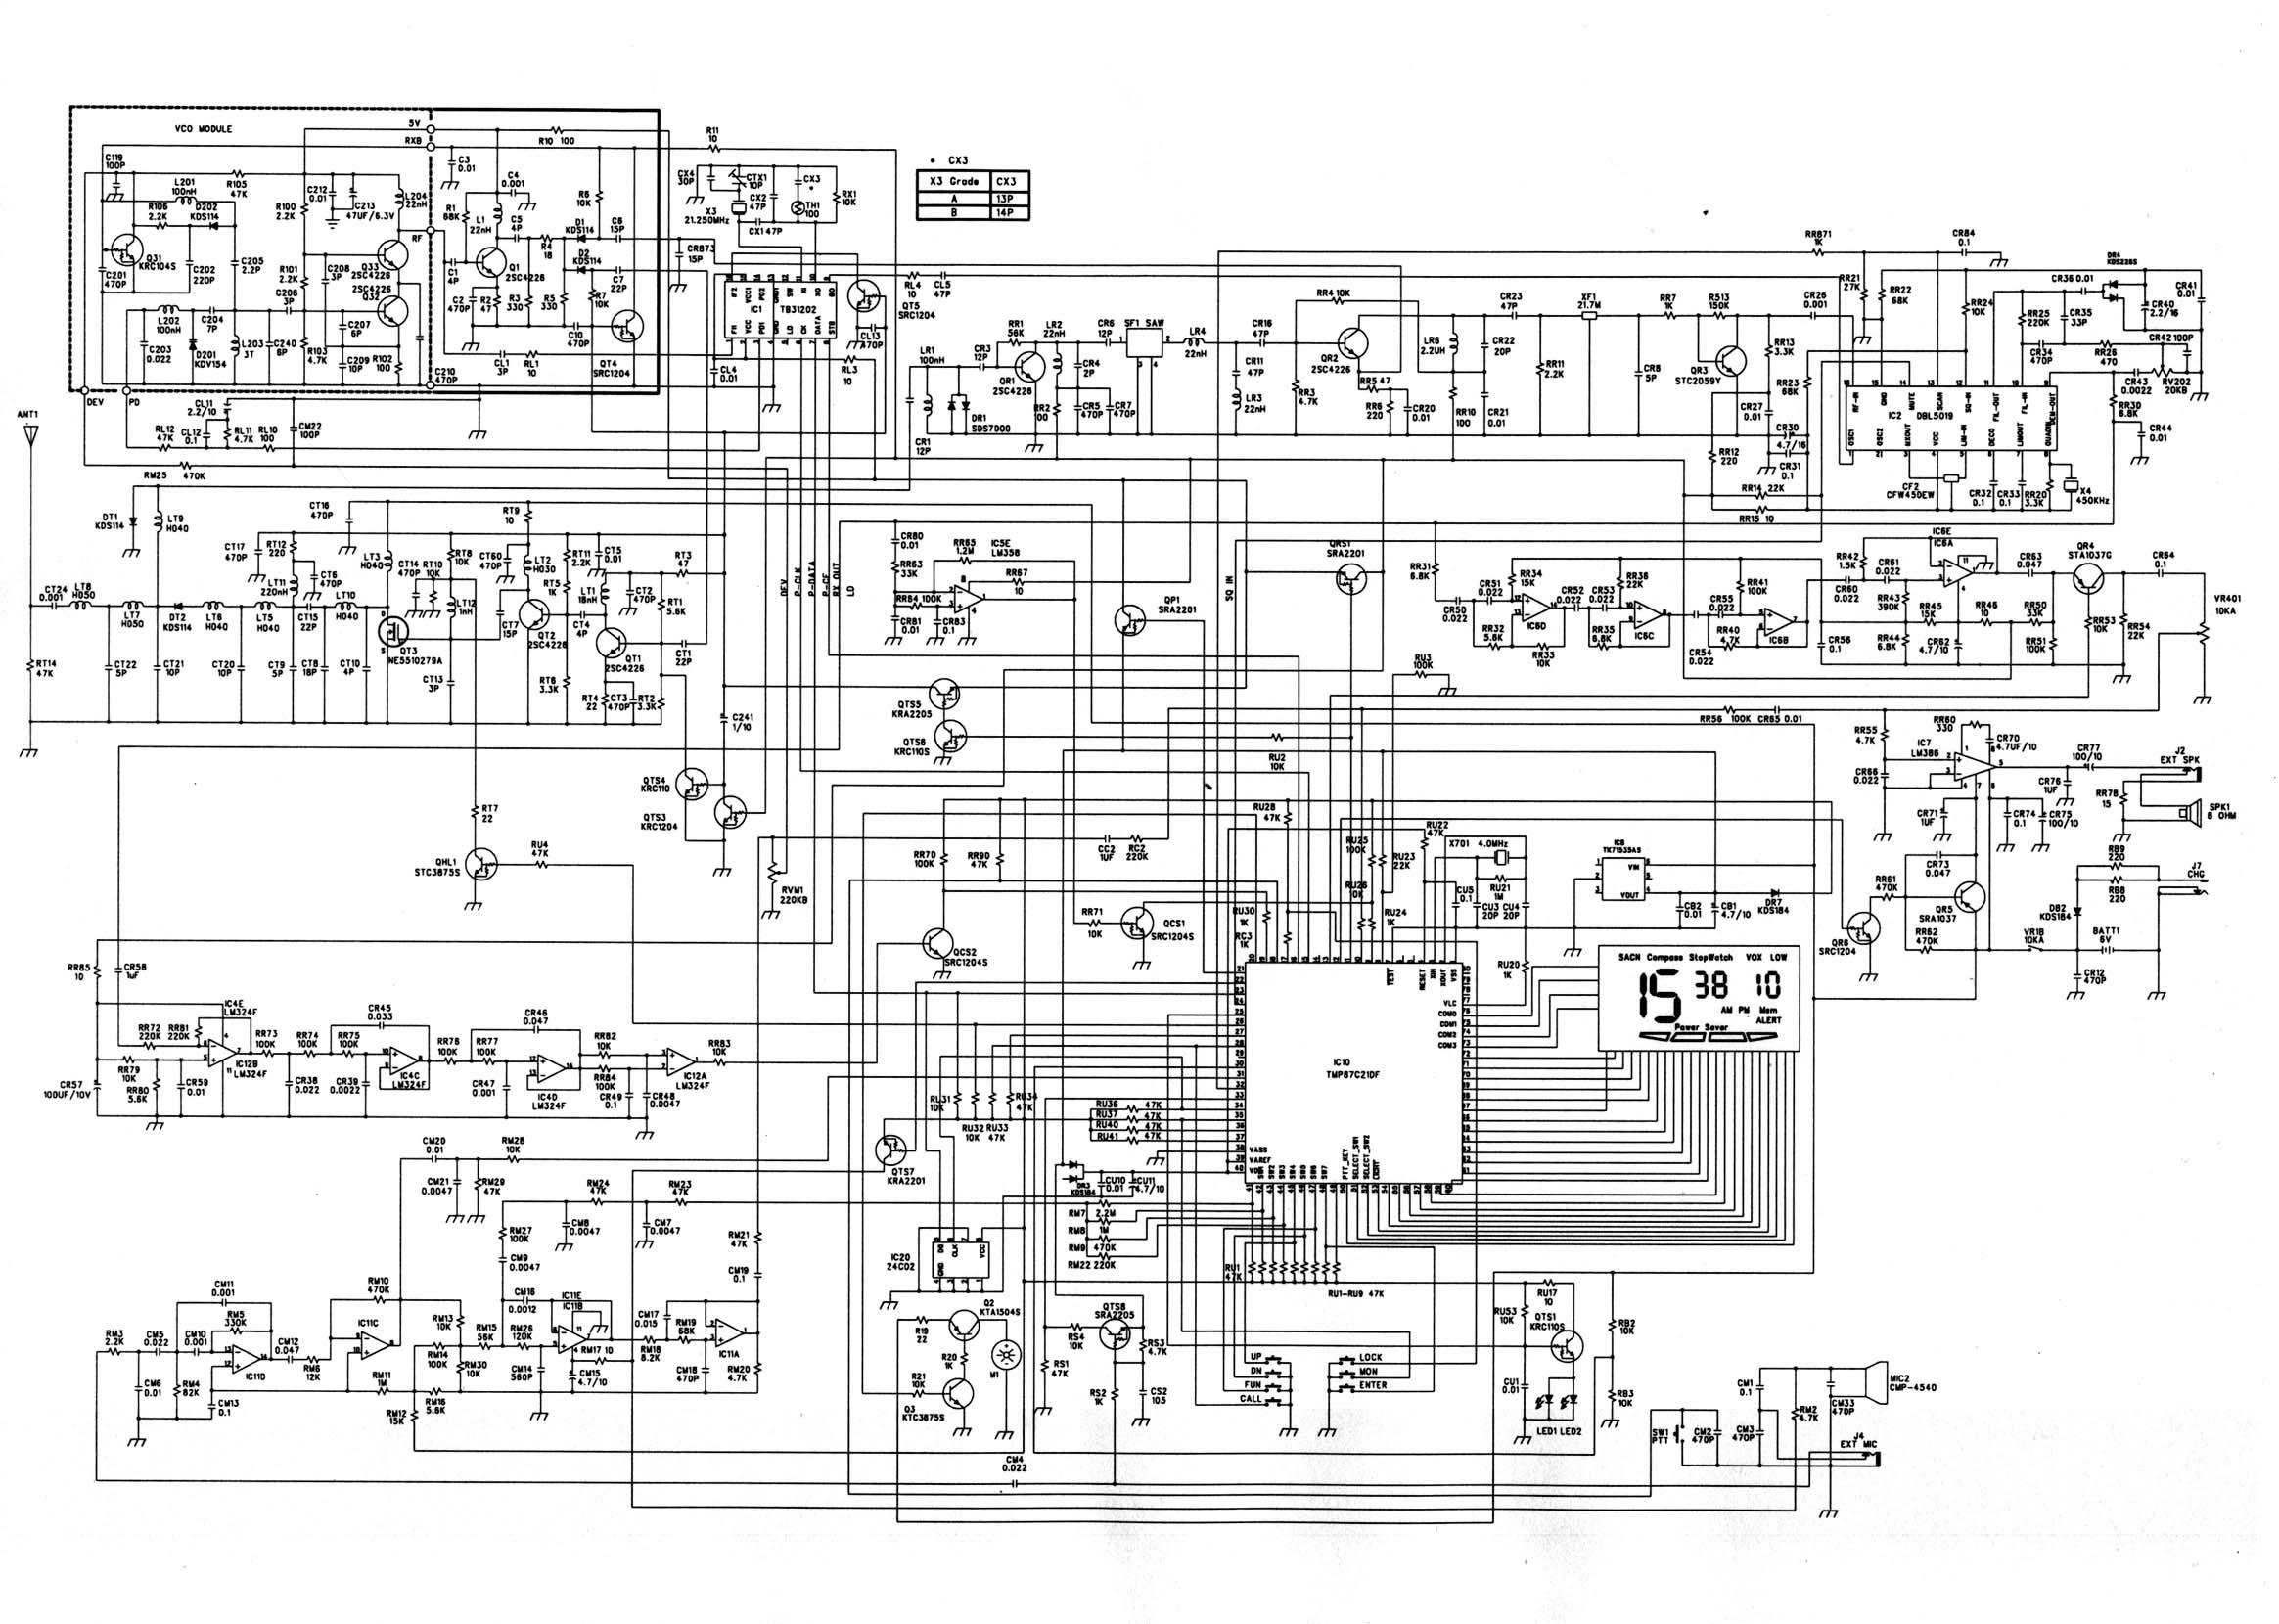 PR950DX_Schematic Radio S Schematic Diagrams on am tube radio, digital multimeter, samsung lcd tv, sony tv, hvac system, computer circuit board,